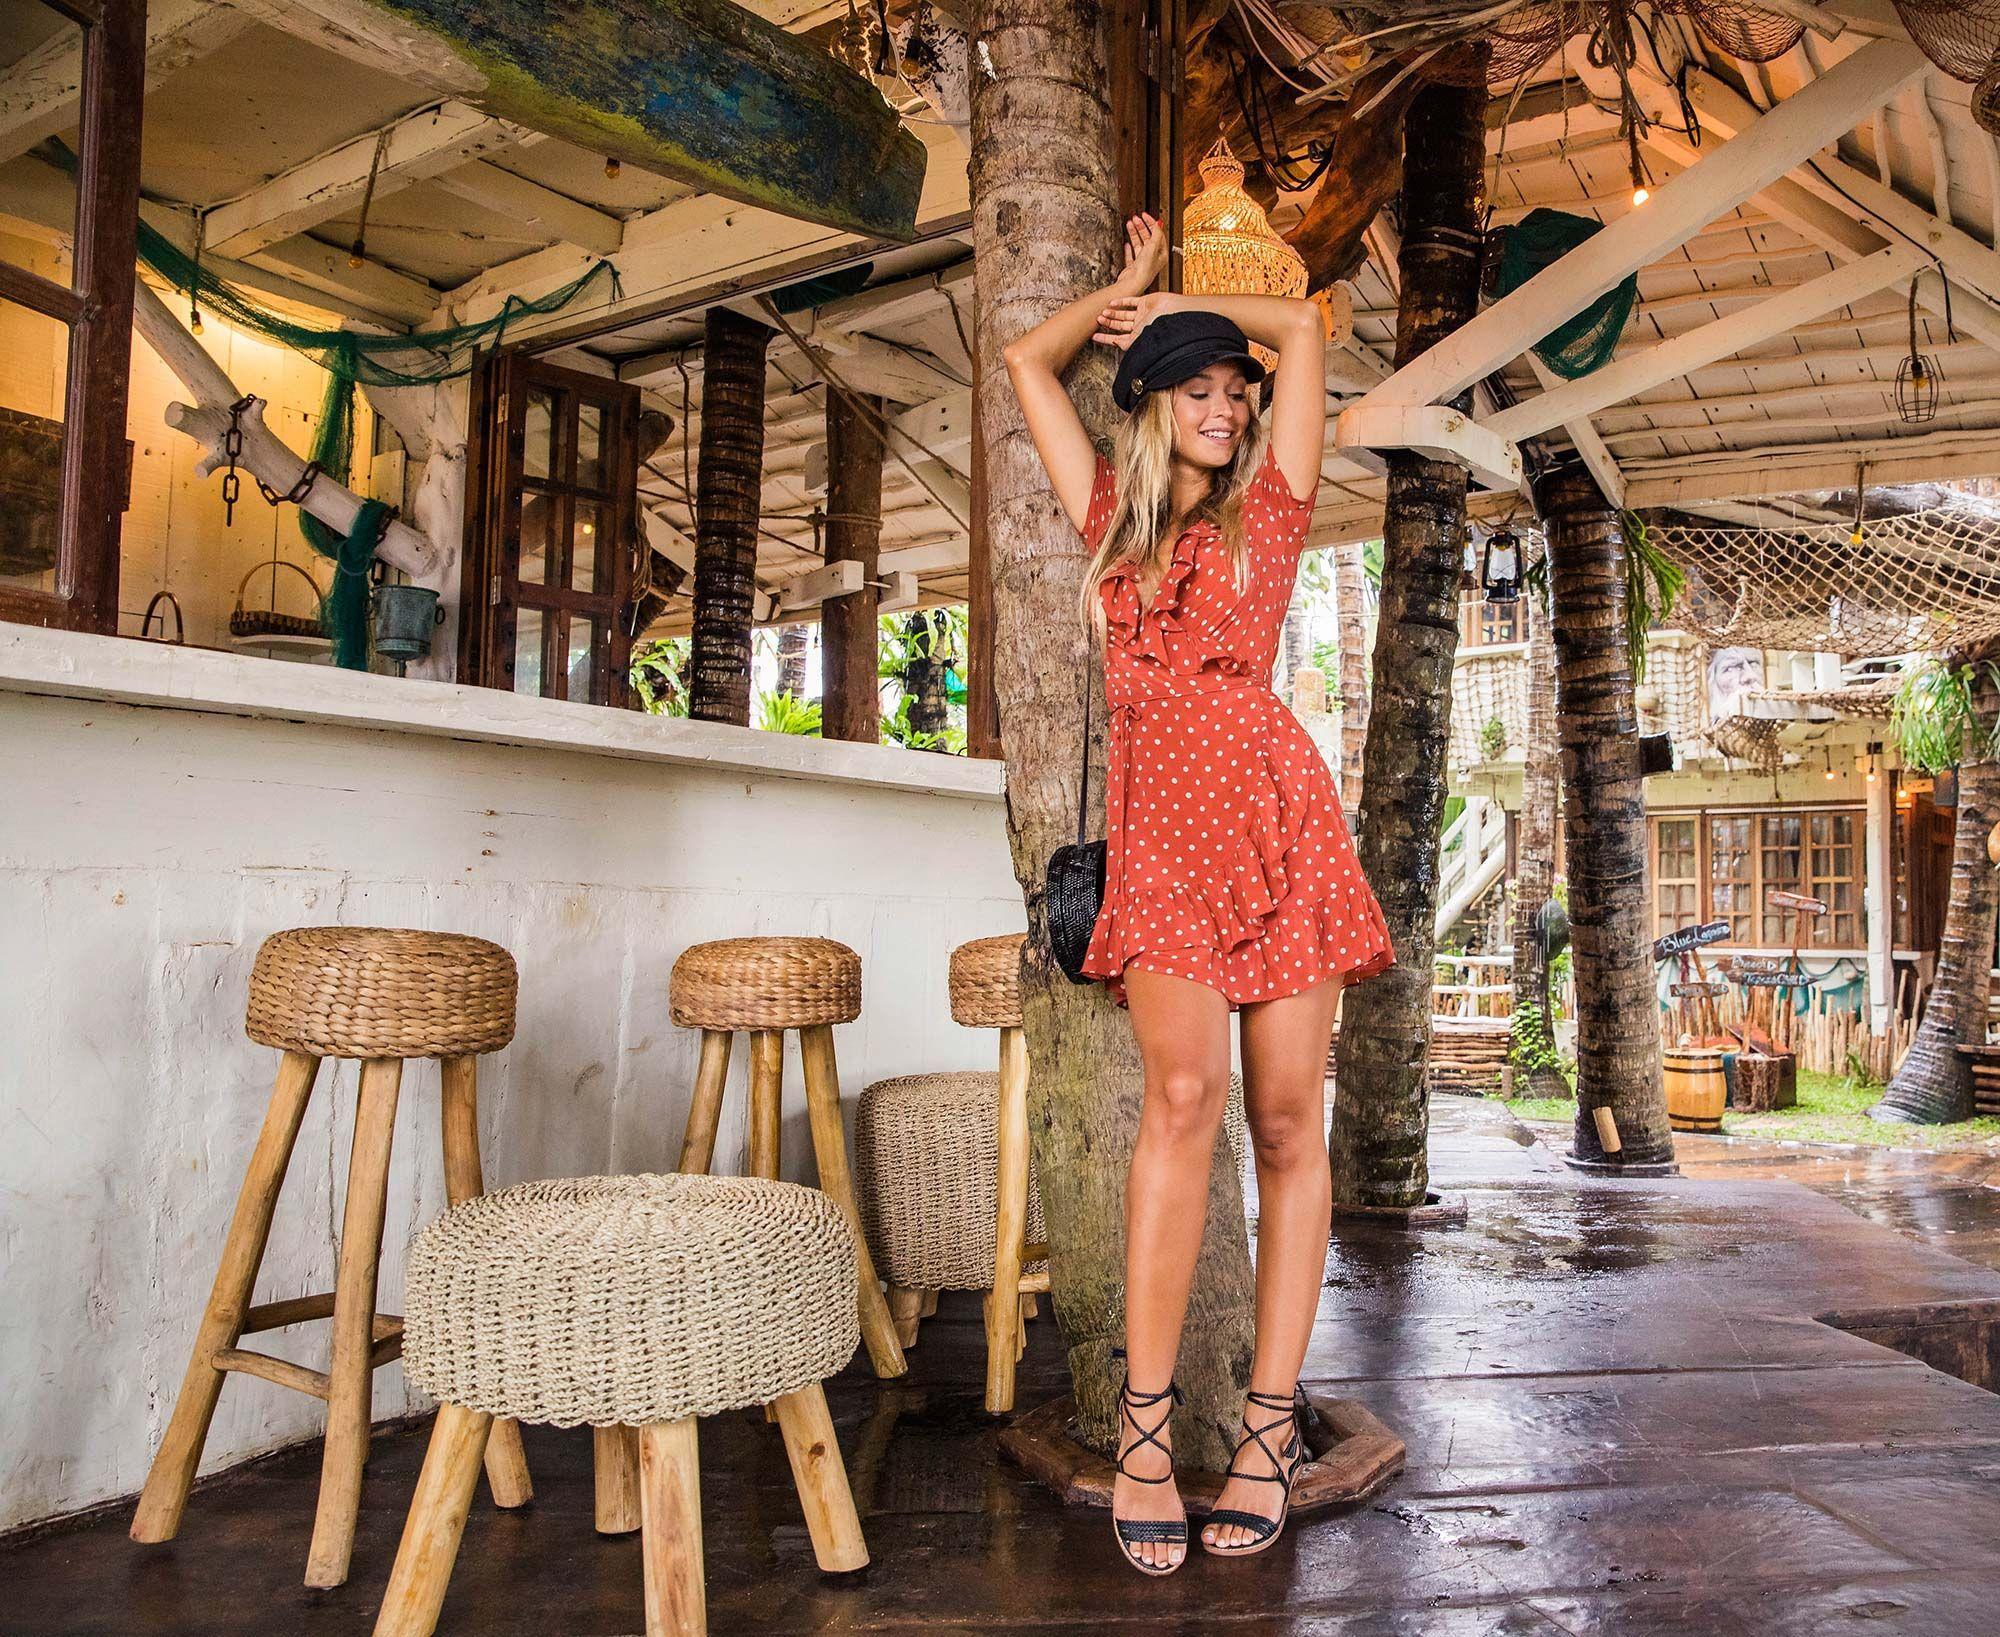 Bared_Footwear_La_Brisa_Bali_Travel_Summer_Womens_Campaign_Galah_Black_Braided_Leather_Sandals